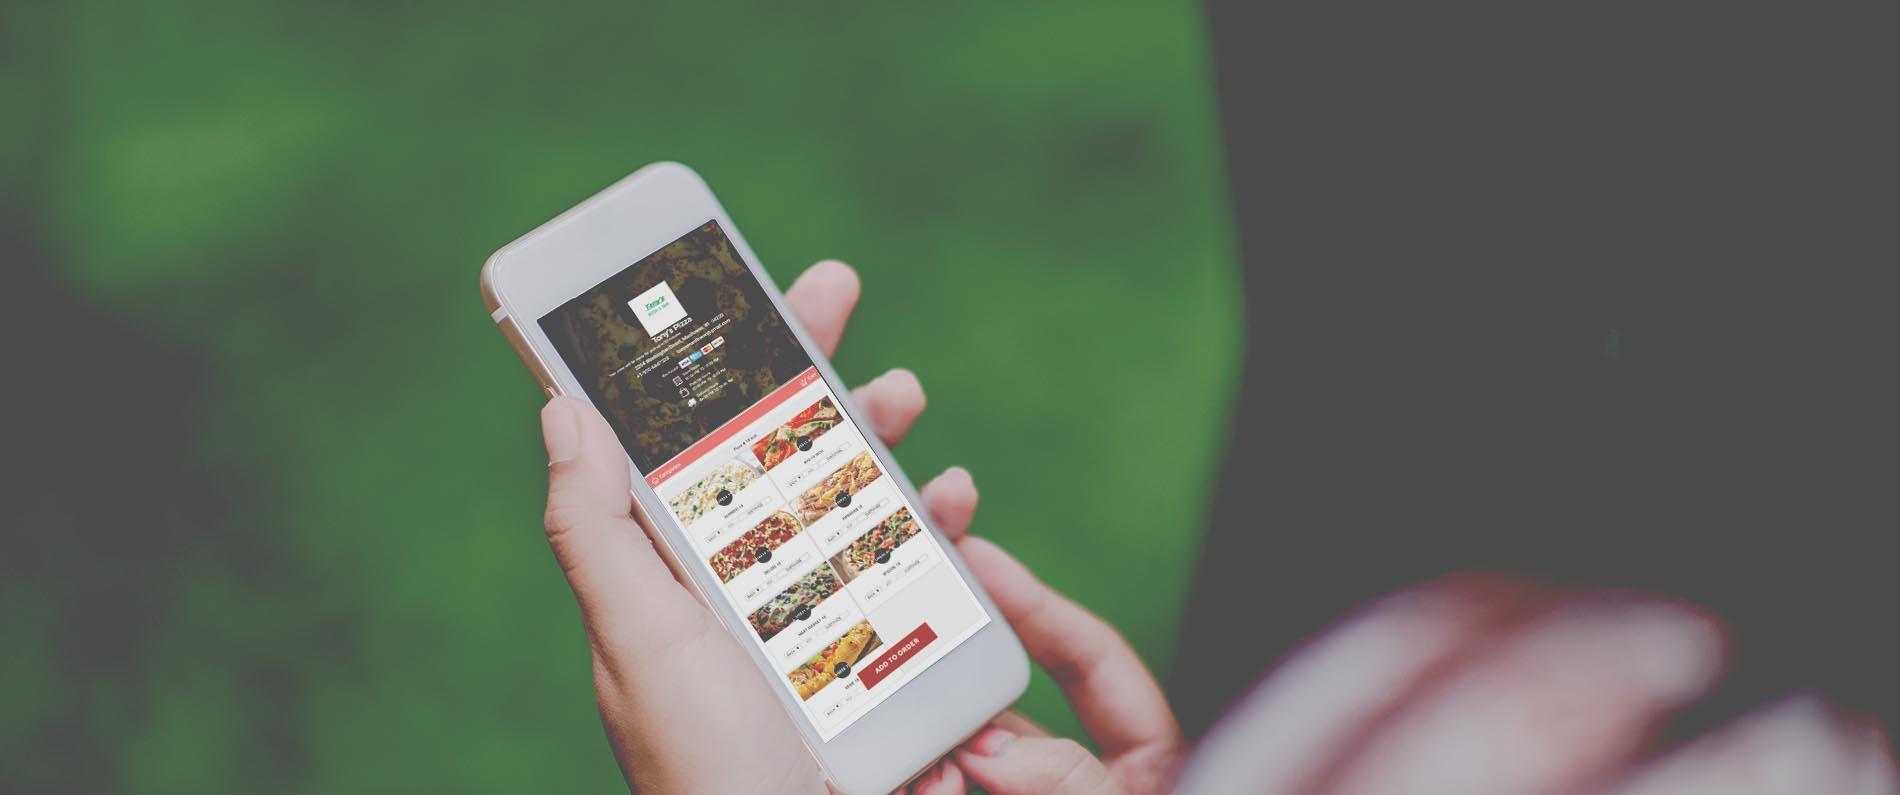 restaurant-online-ordering-system